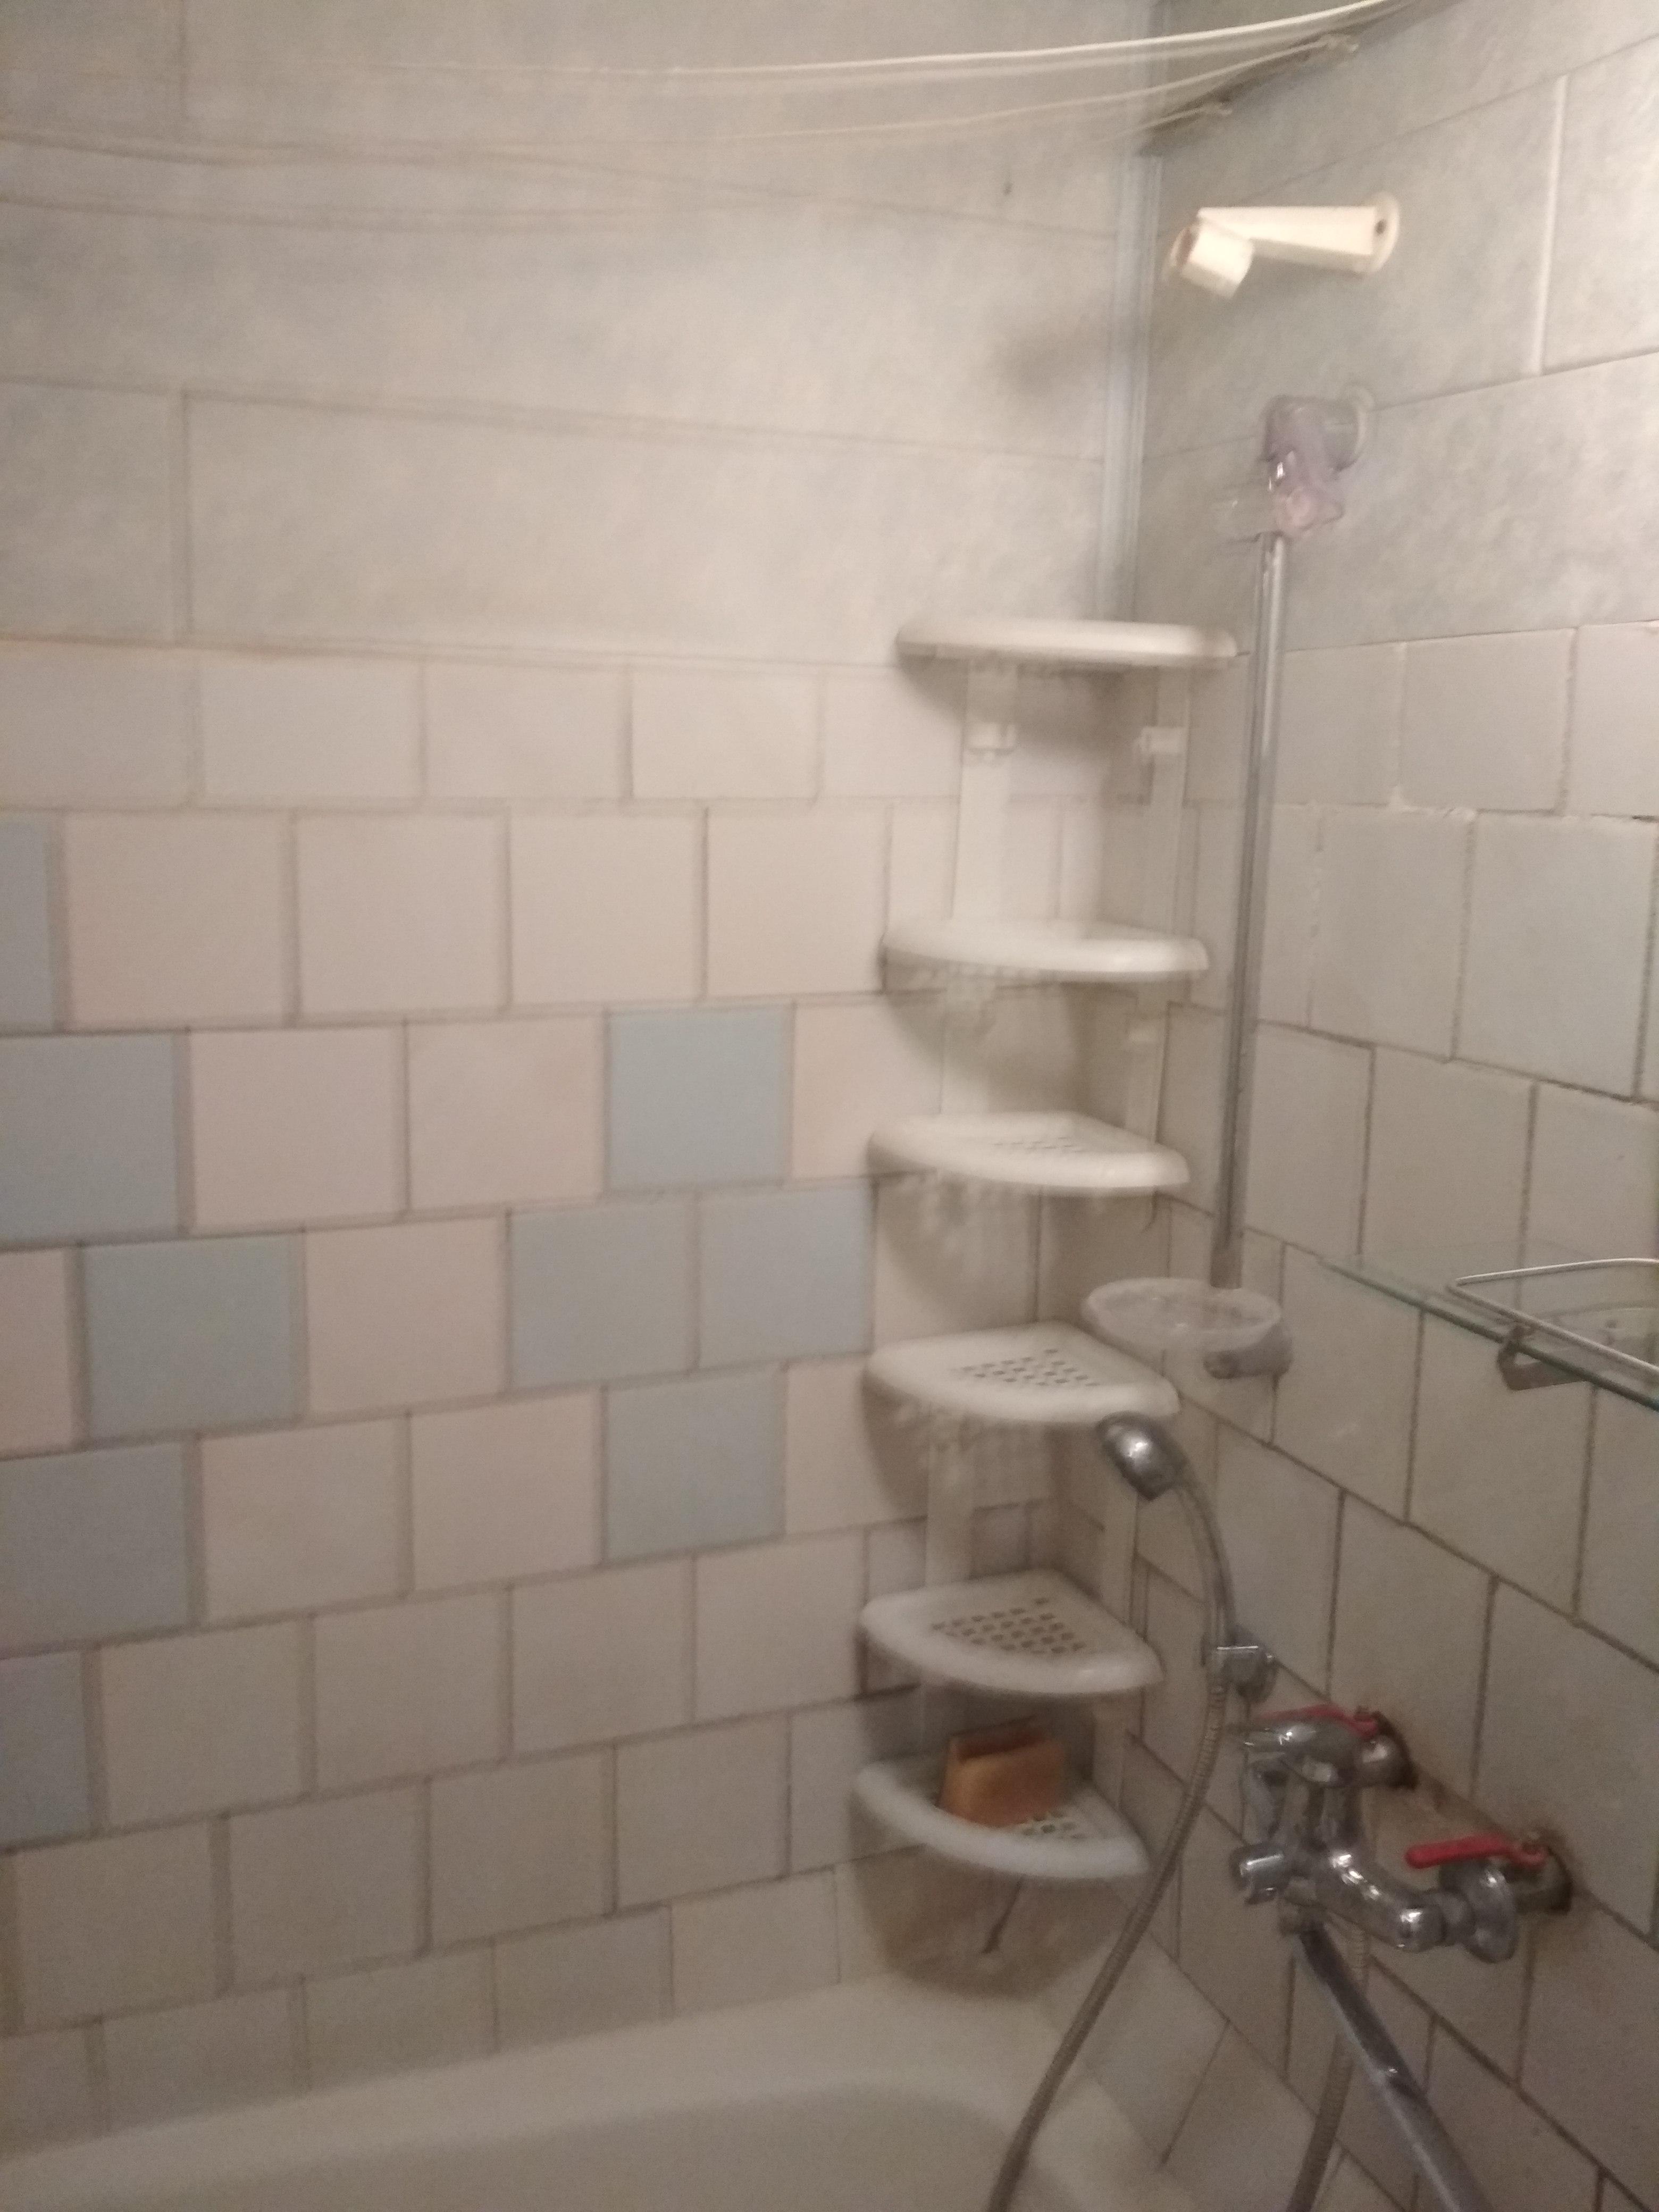 Продаётся 2-комнатная квартира 48.0 кв.м. этаж 5/5 за 2 350 000 руб